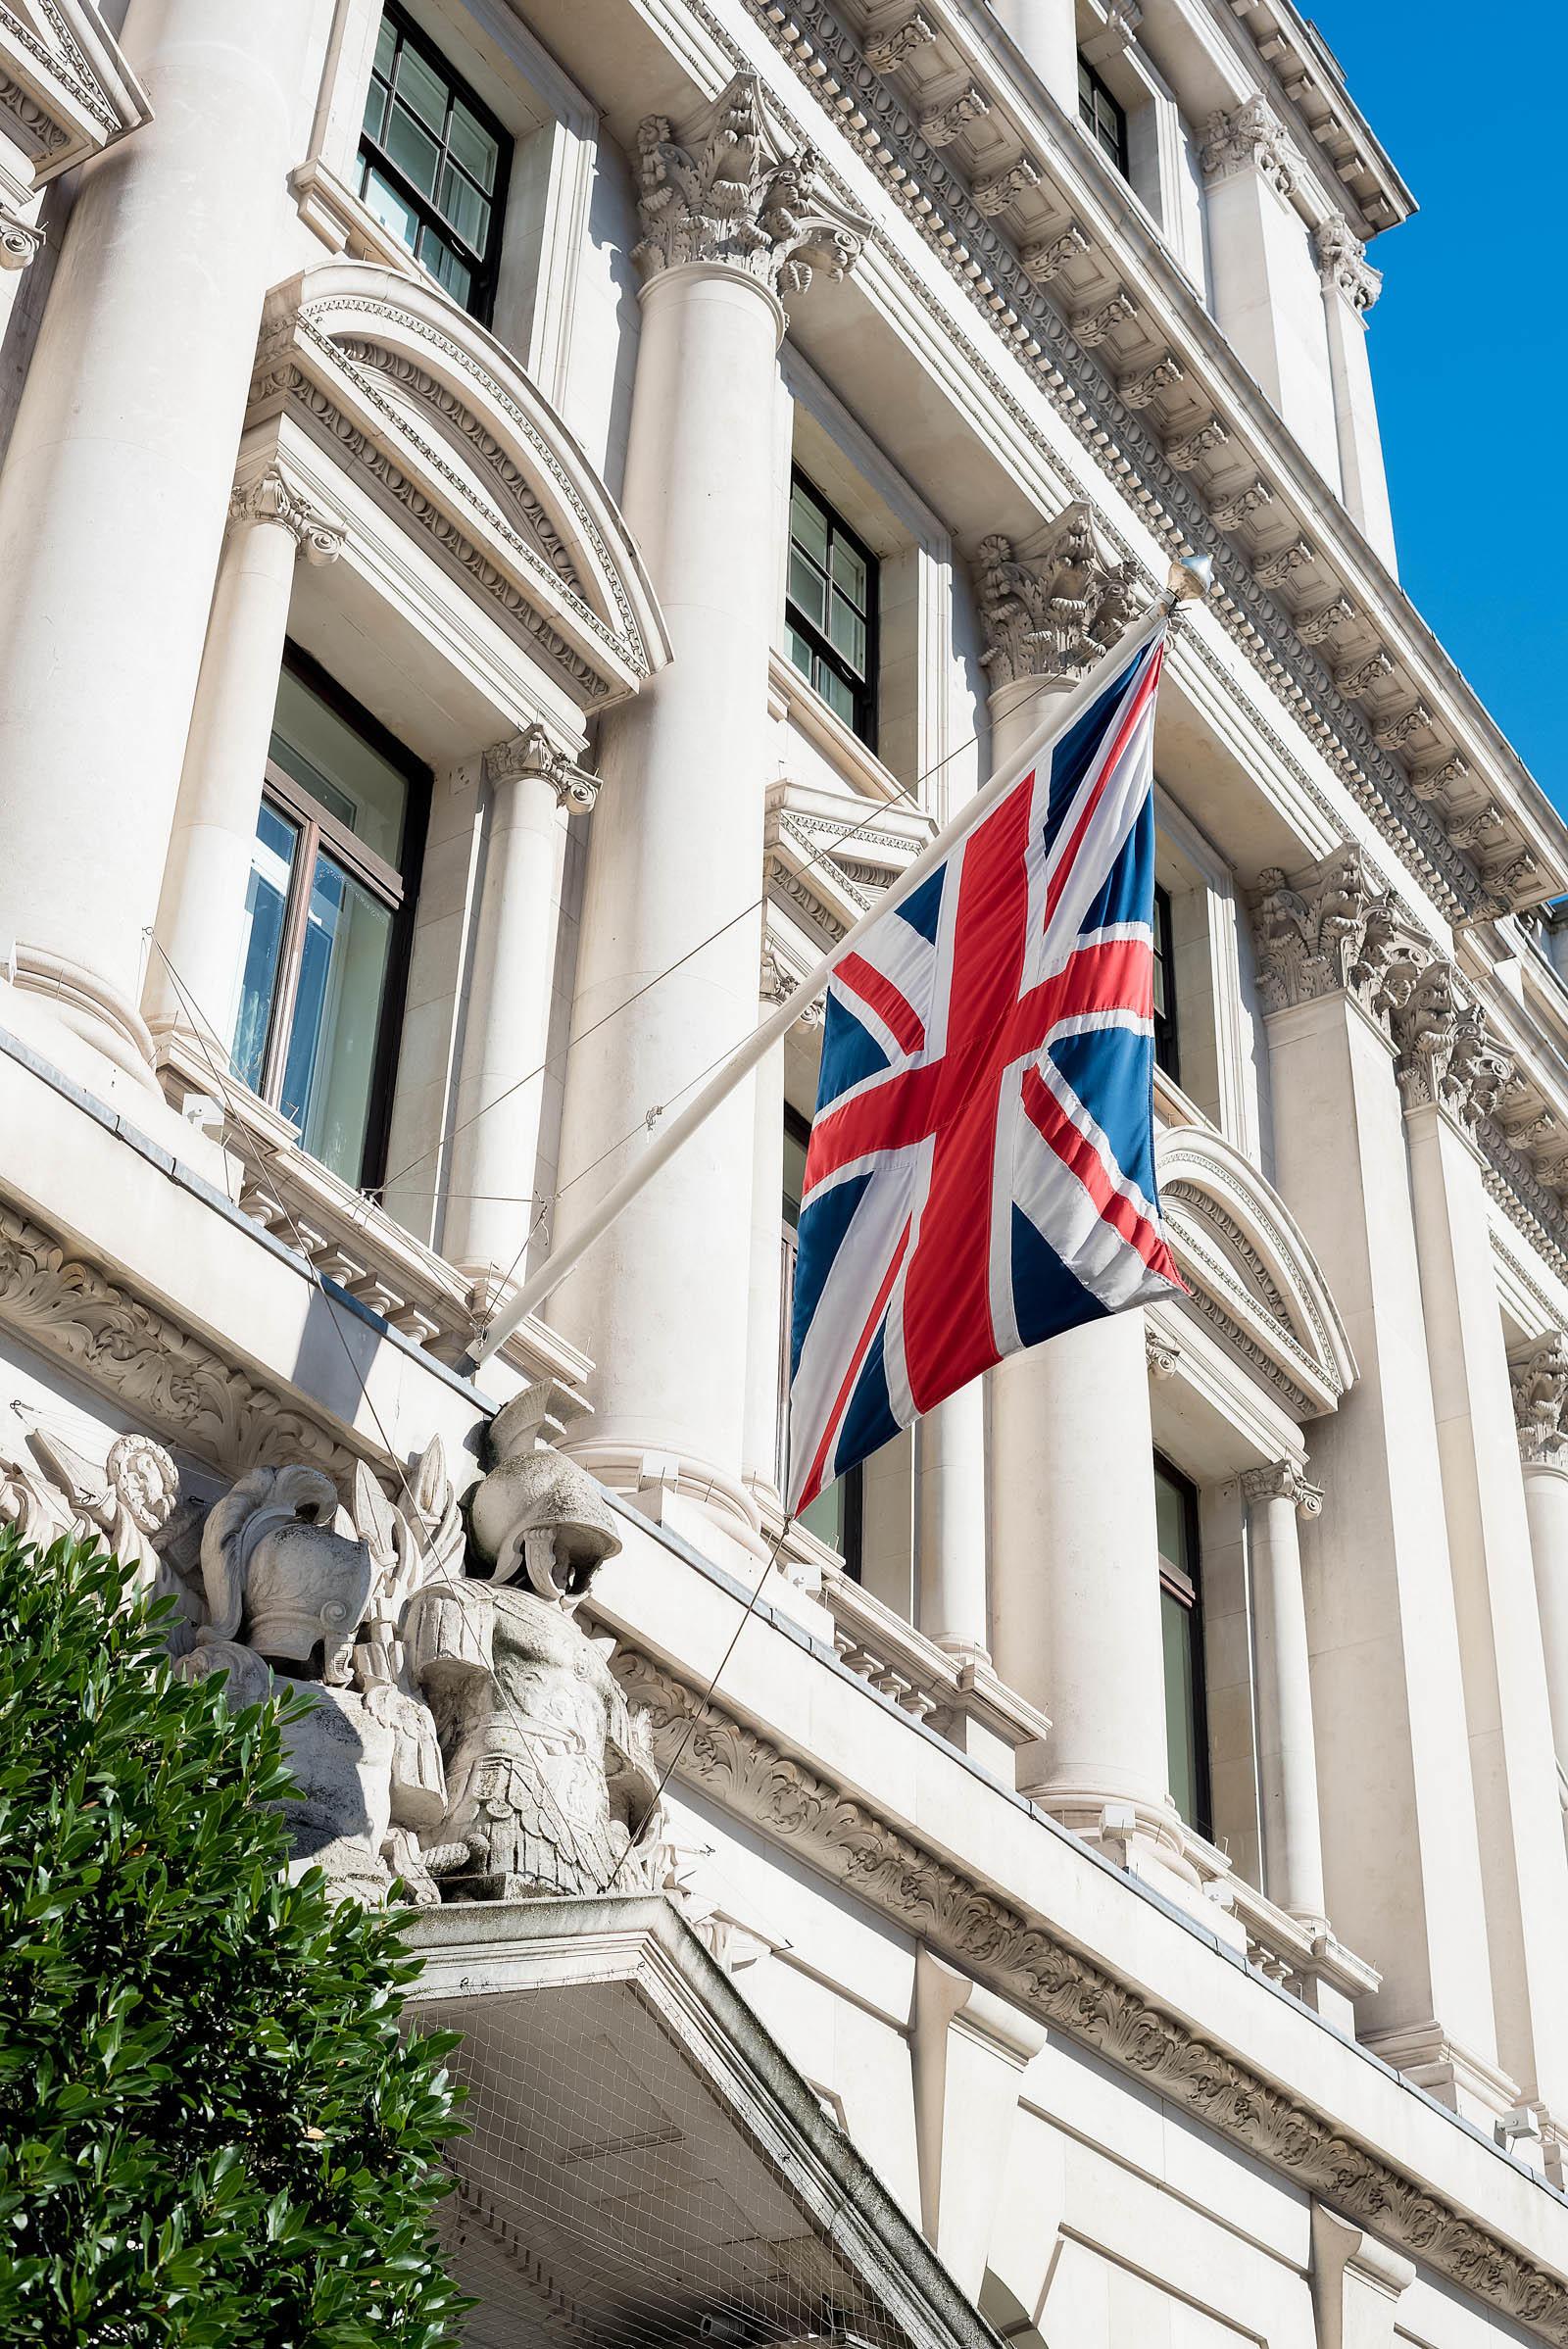 Sofitel St. James London Hotel